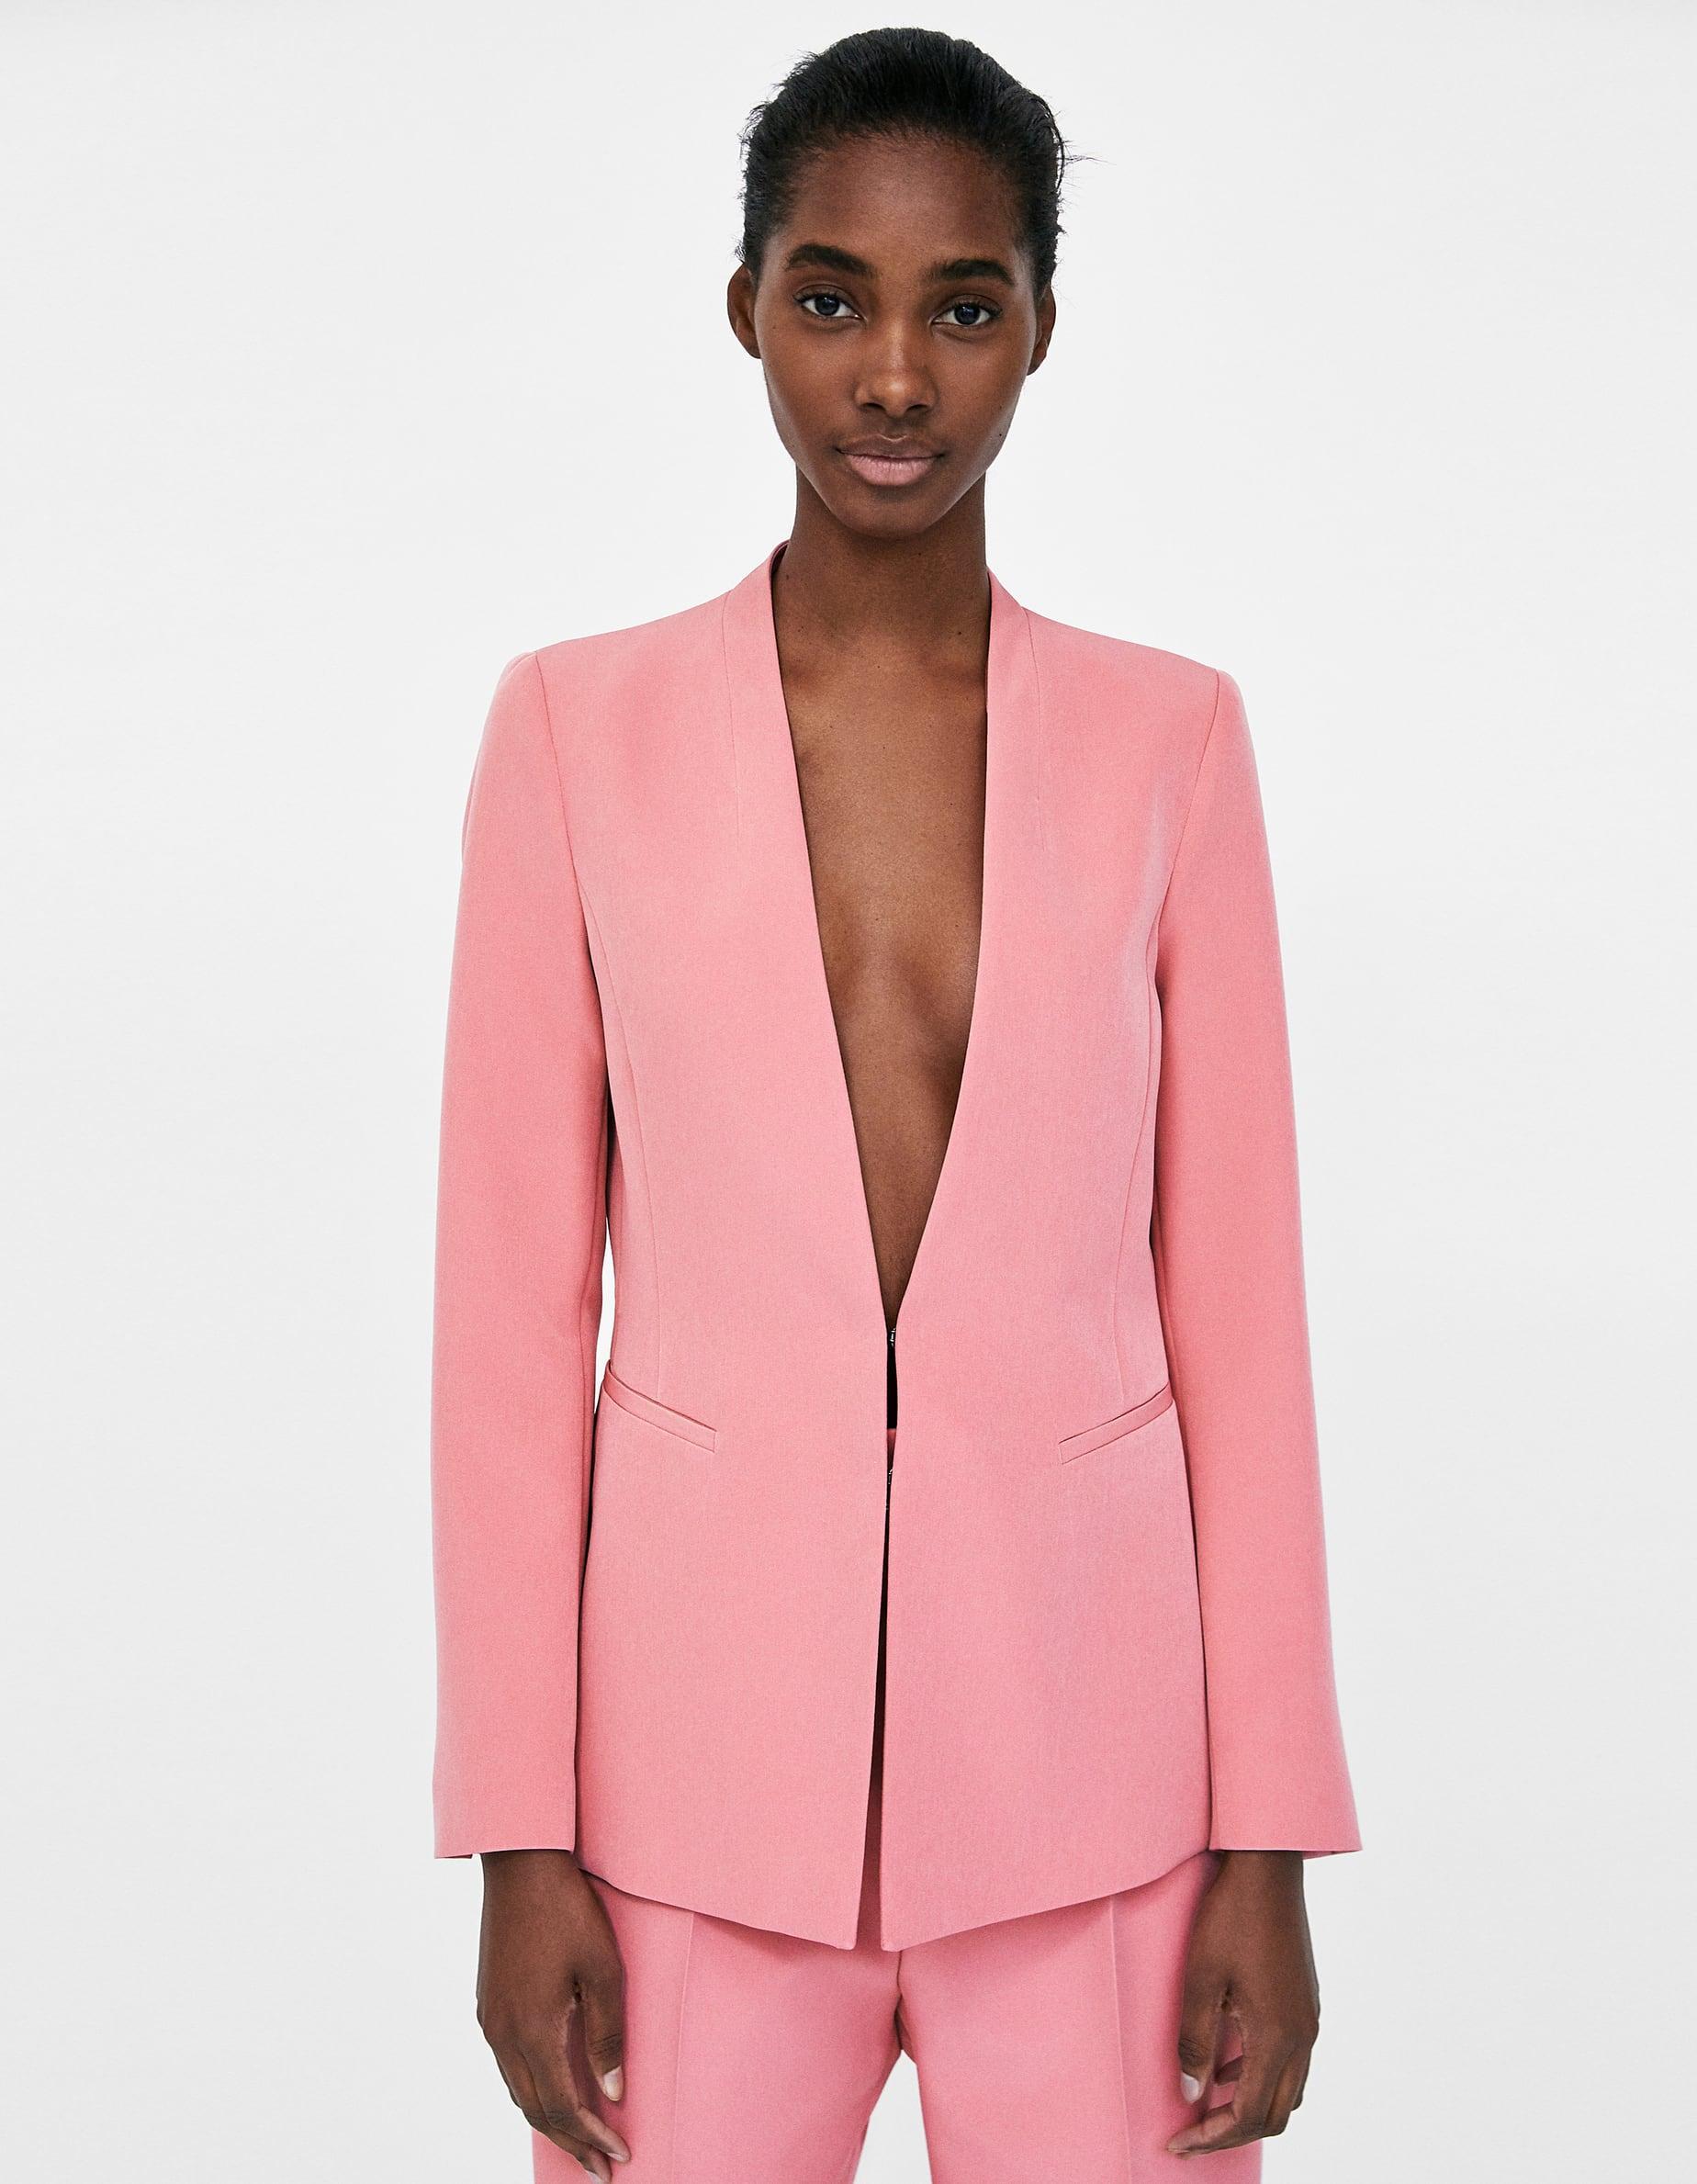 Radar mode #29 : un costume rose pour le